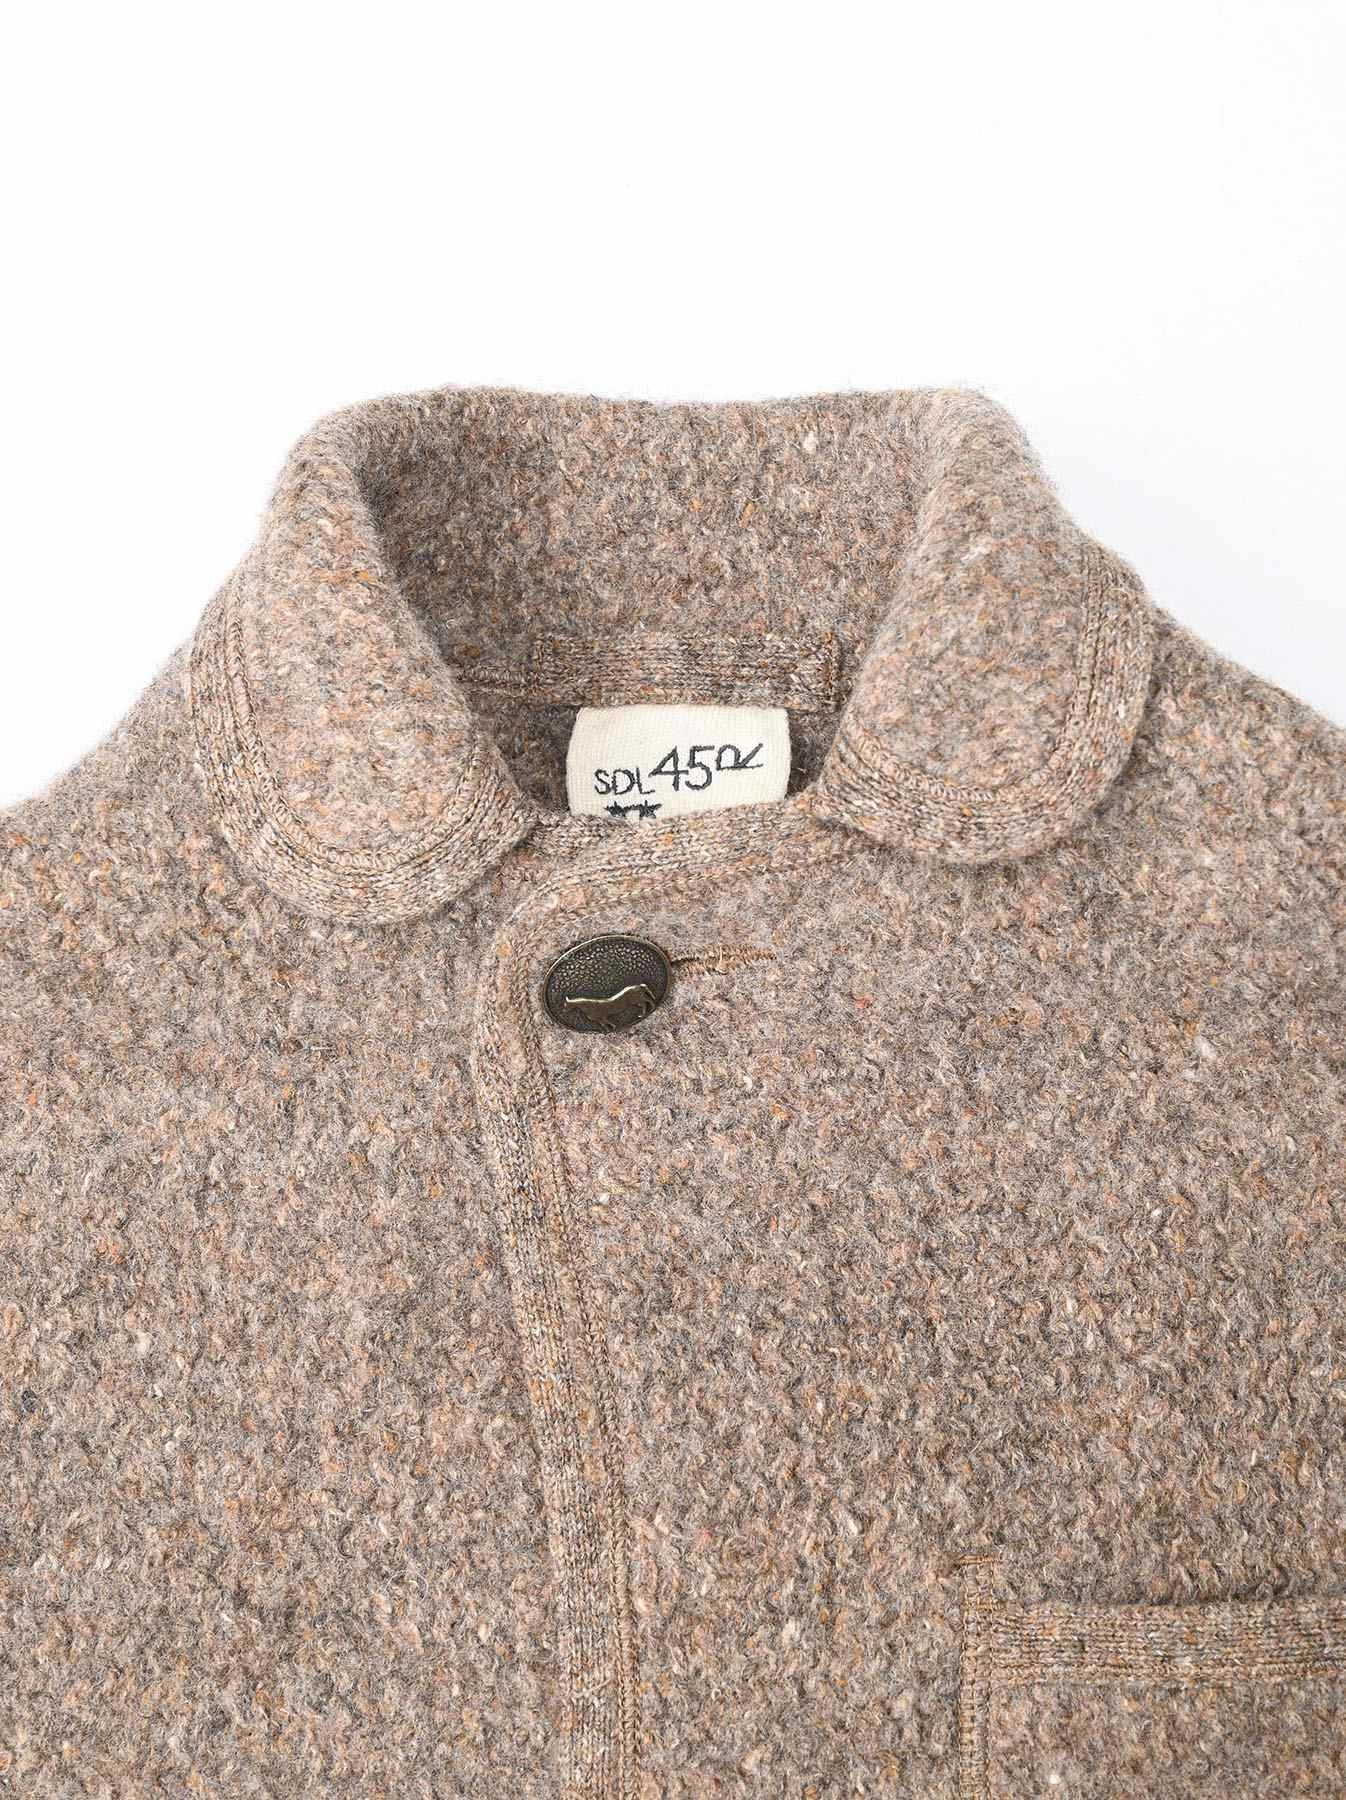 Cotton Shetland 908 Tyrolean Jacket-6